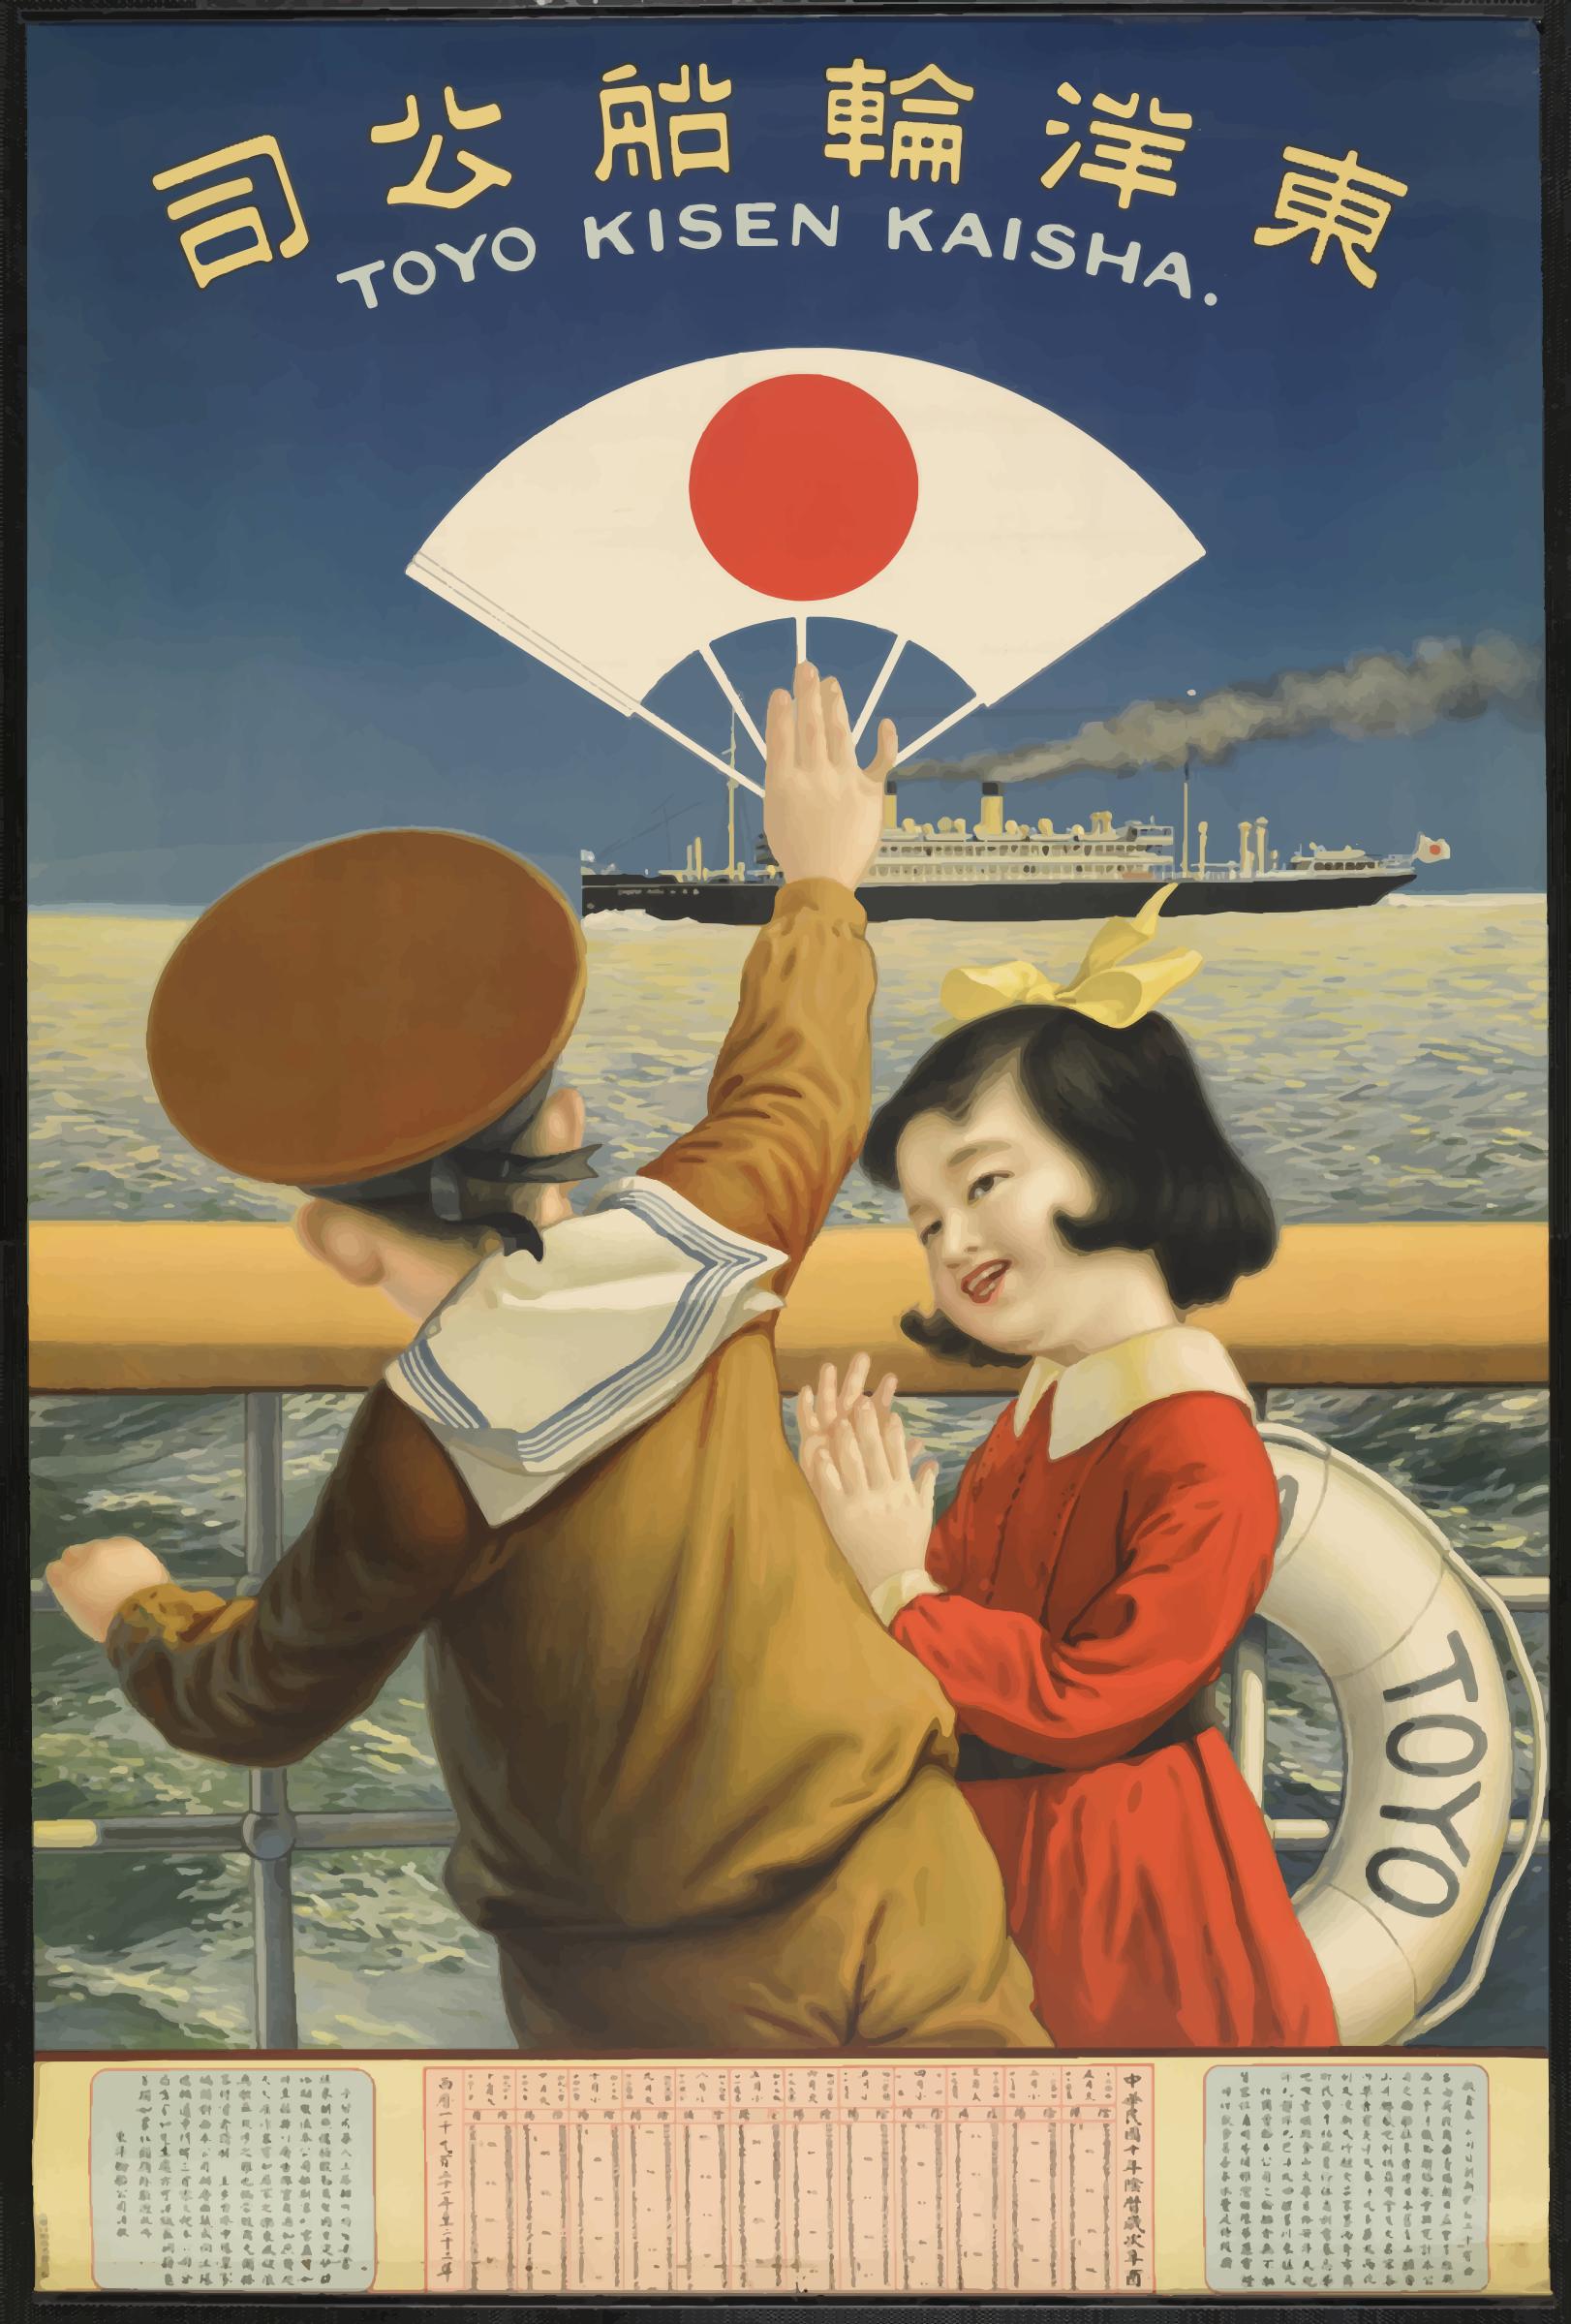 Clipart Vintage Travel Poster Japan 2